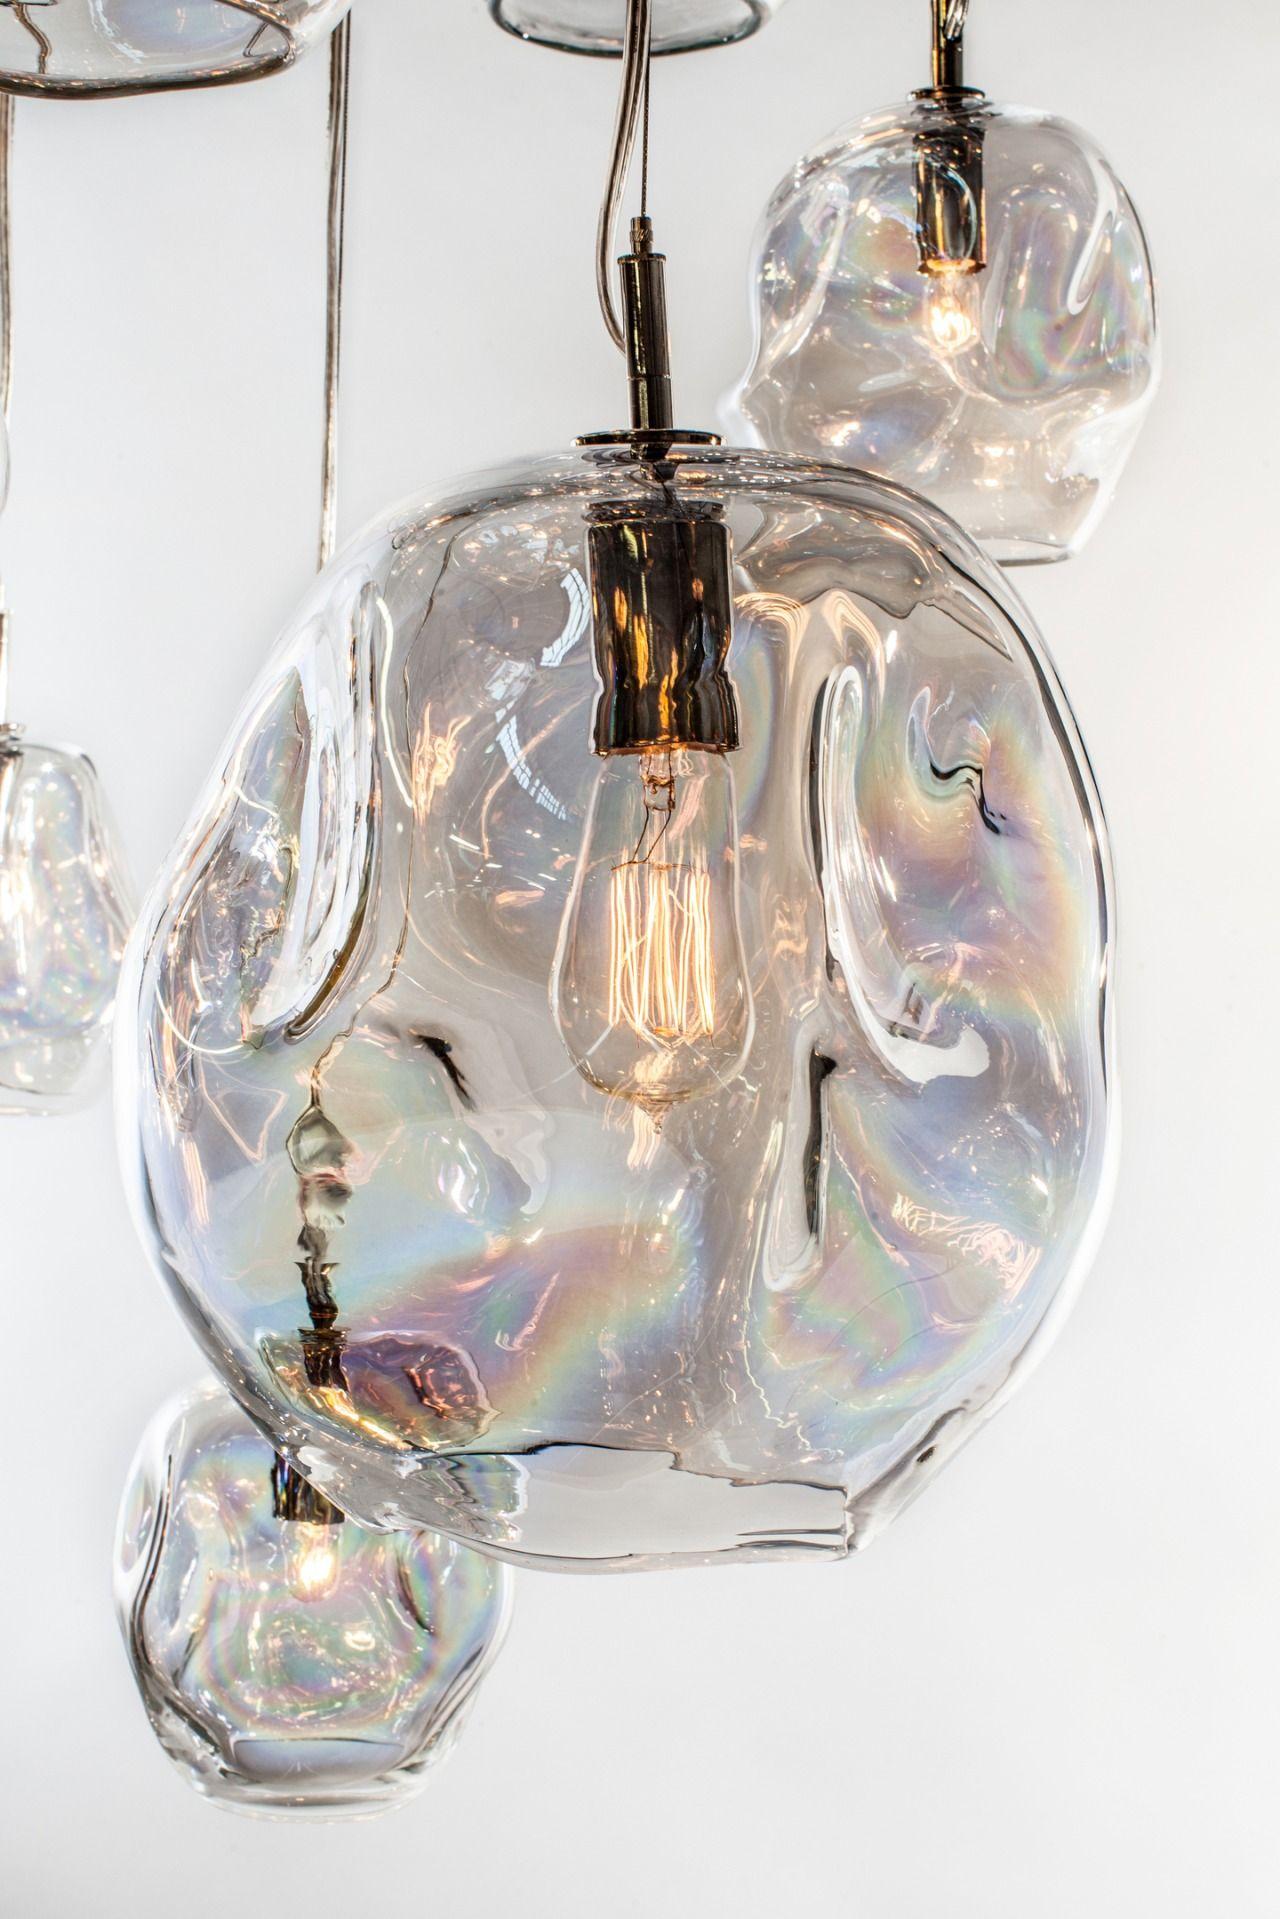 hand blown glass pendant lighting. Lights · Vjeranski: \u201c John Pomp Studios Infinity Interior Design HAND-BLOWN SCULPTED GLASS PENDANT SEE Hand Blown Glass Pendant Lighting